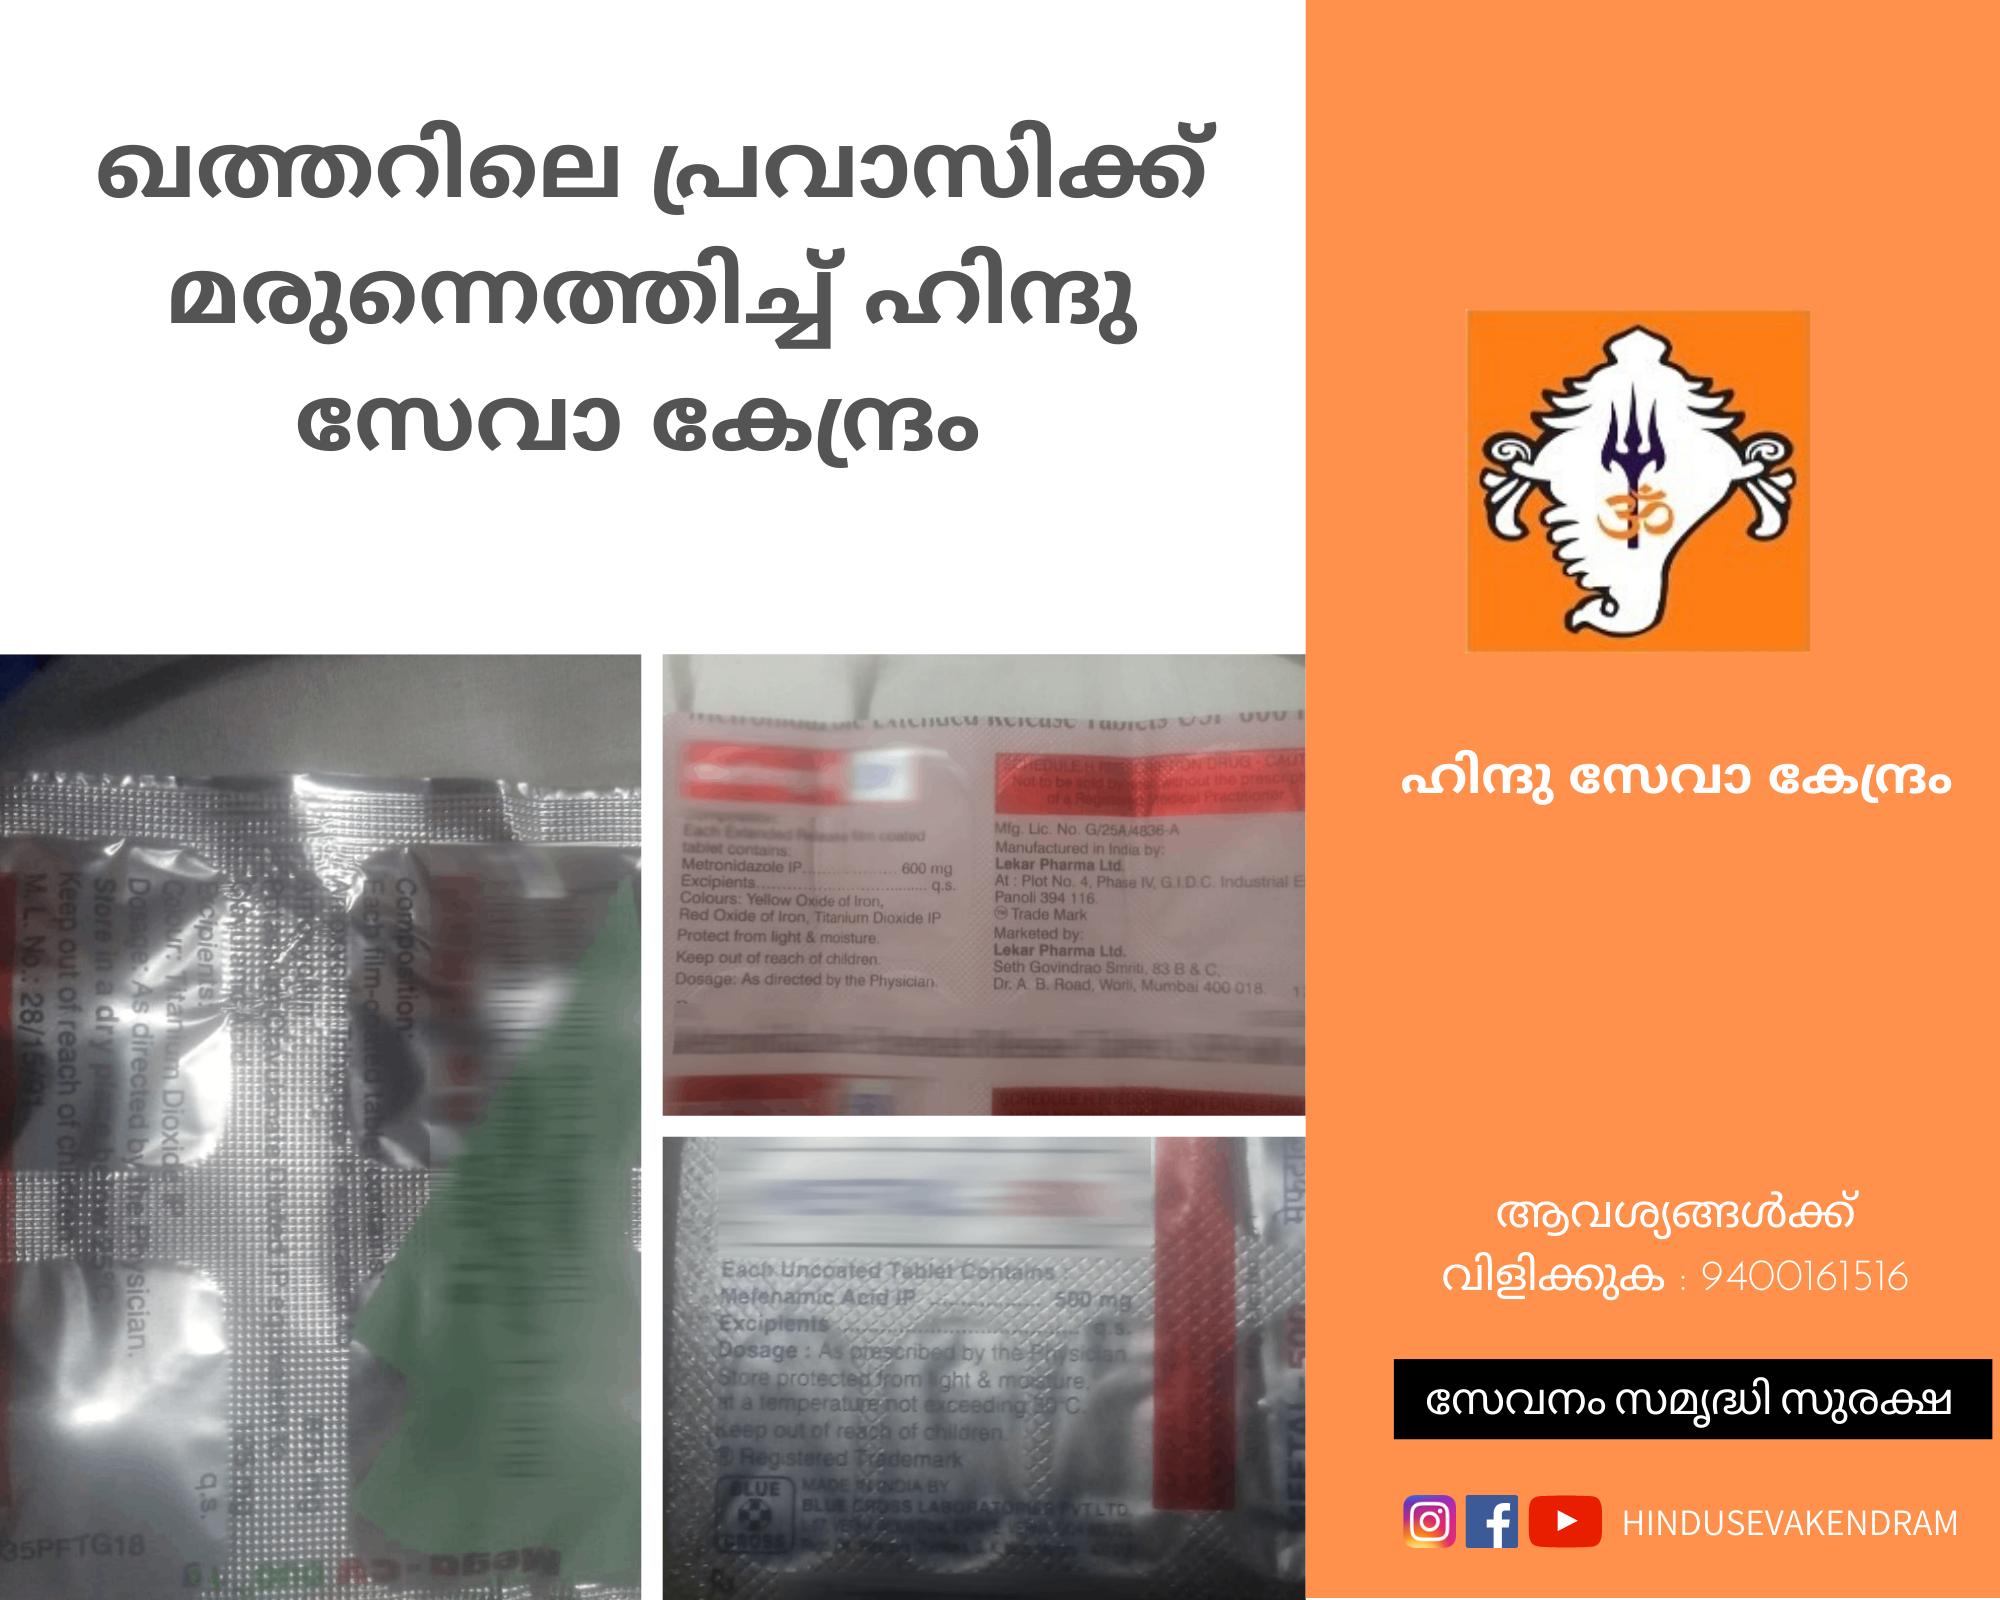 hindu seva kendram delivers medicine to expat in qatar